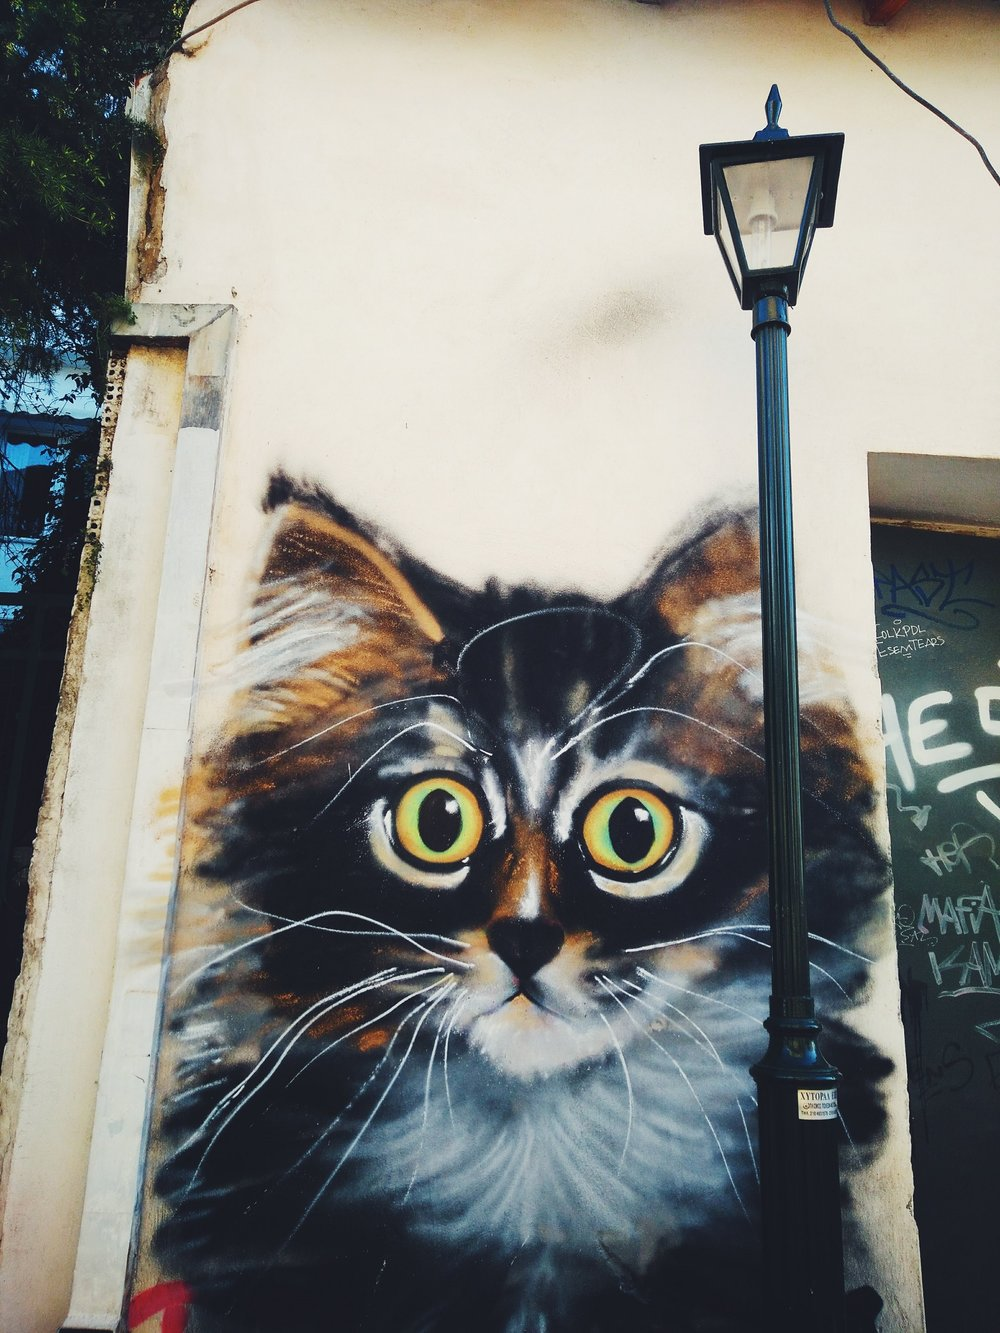 Graffiti in Kisifia